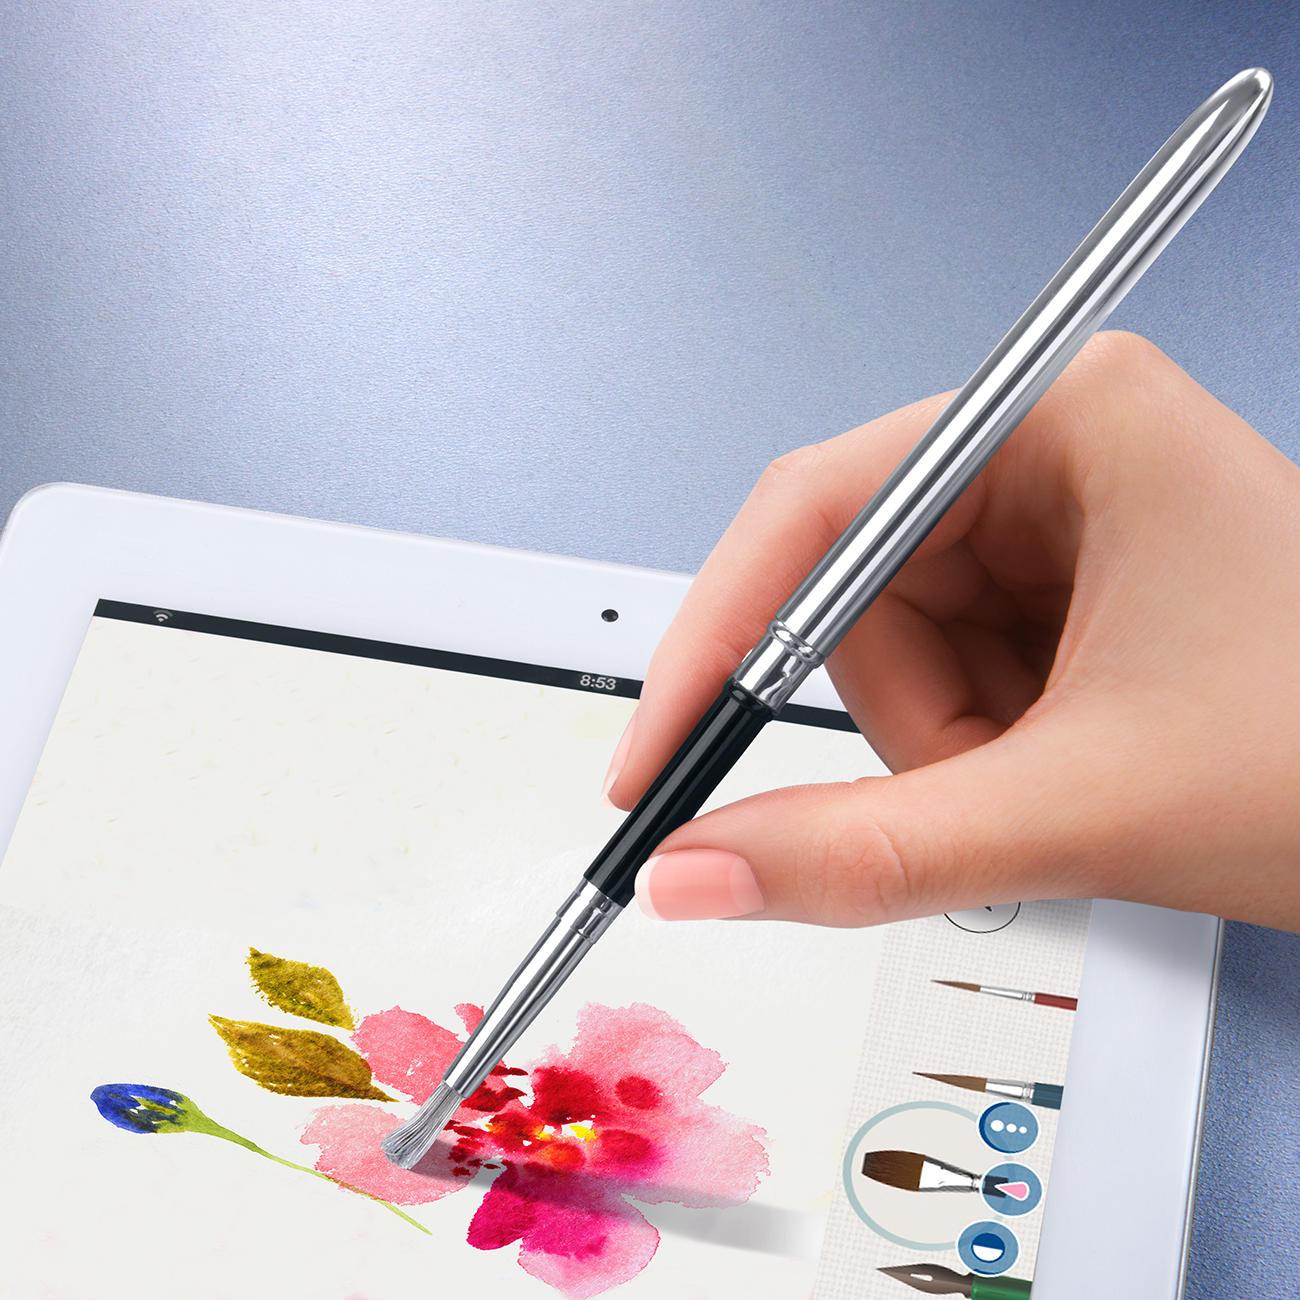 Touchscreen pinsel pen 3 jahre garantie pro idee - Couchscreen leinwand ...